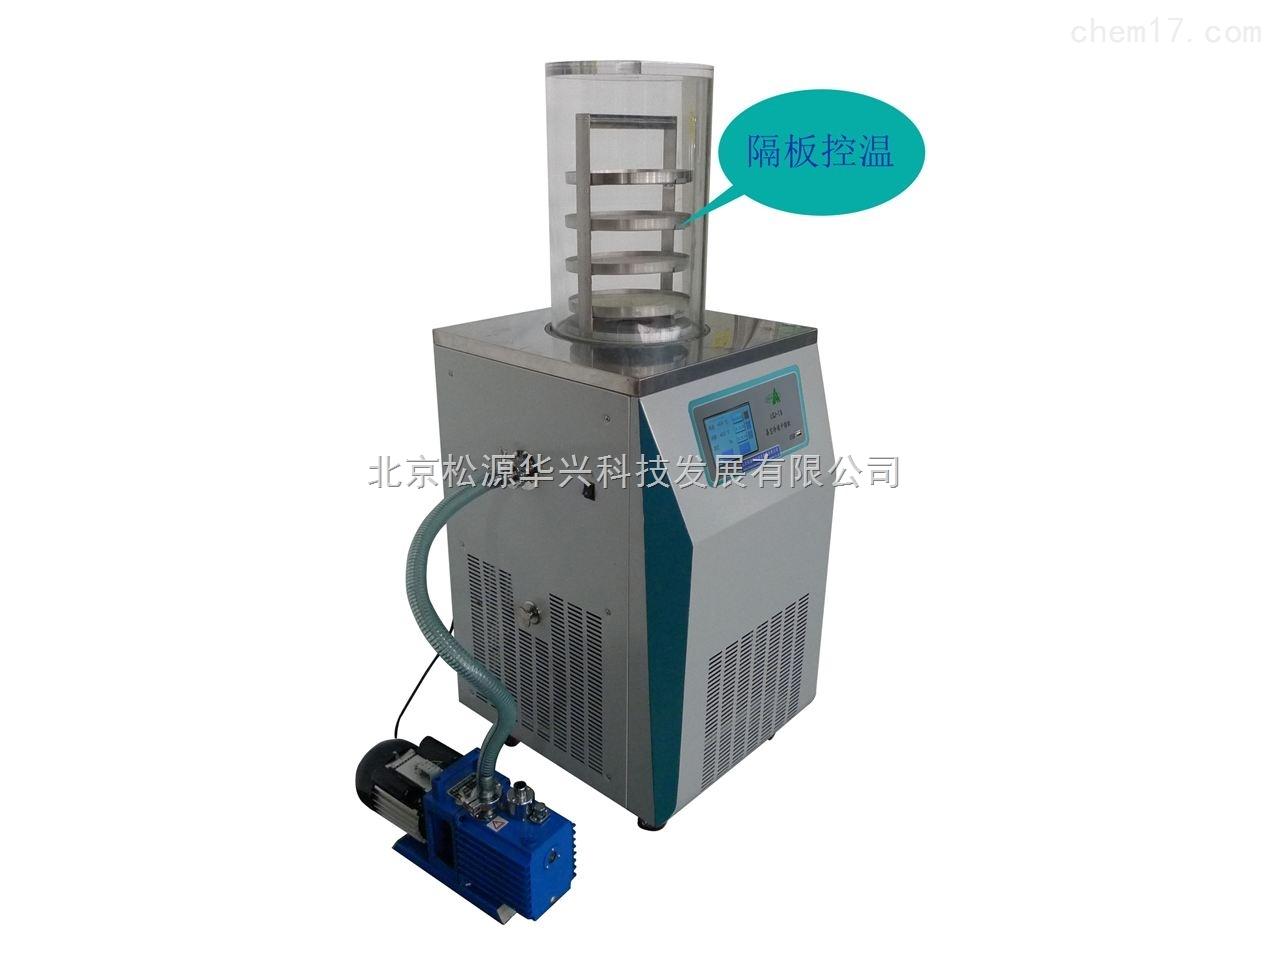 LGJ-18S电加热真空冷冻干燥机